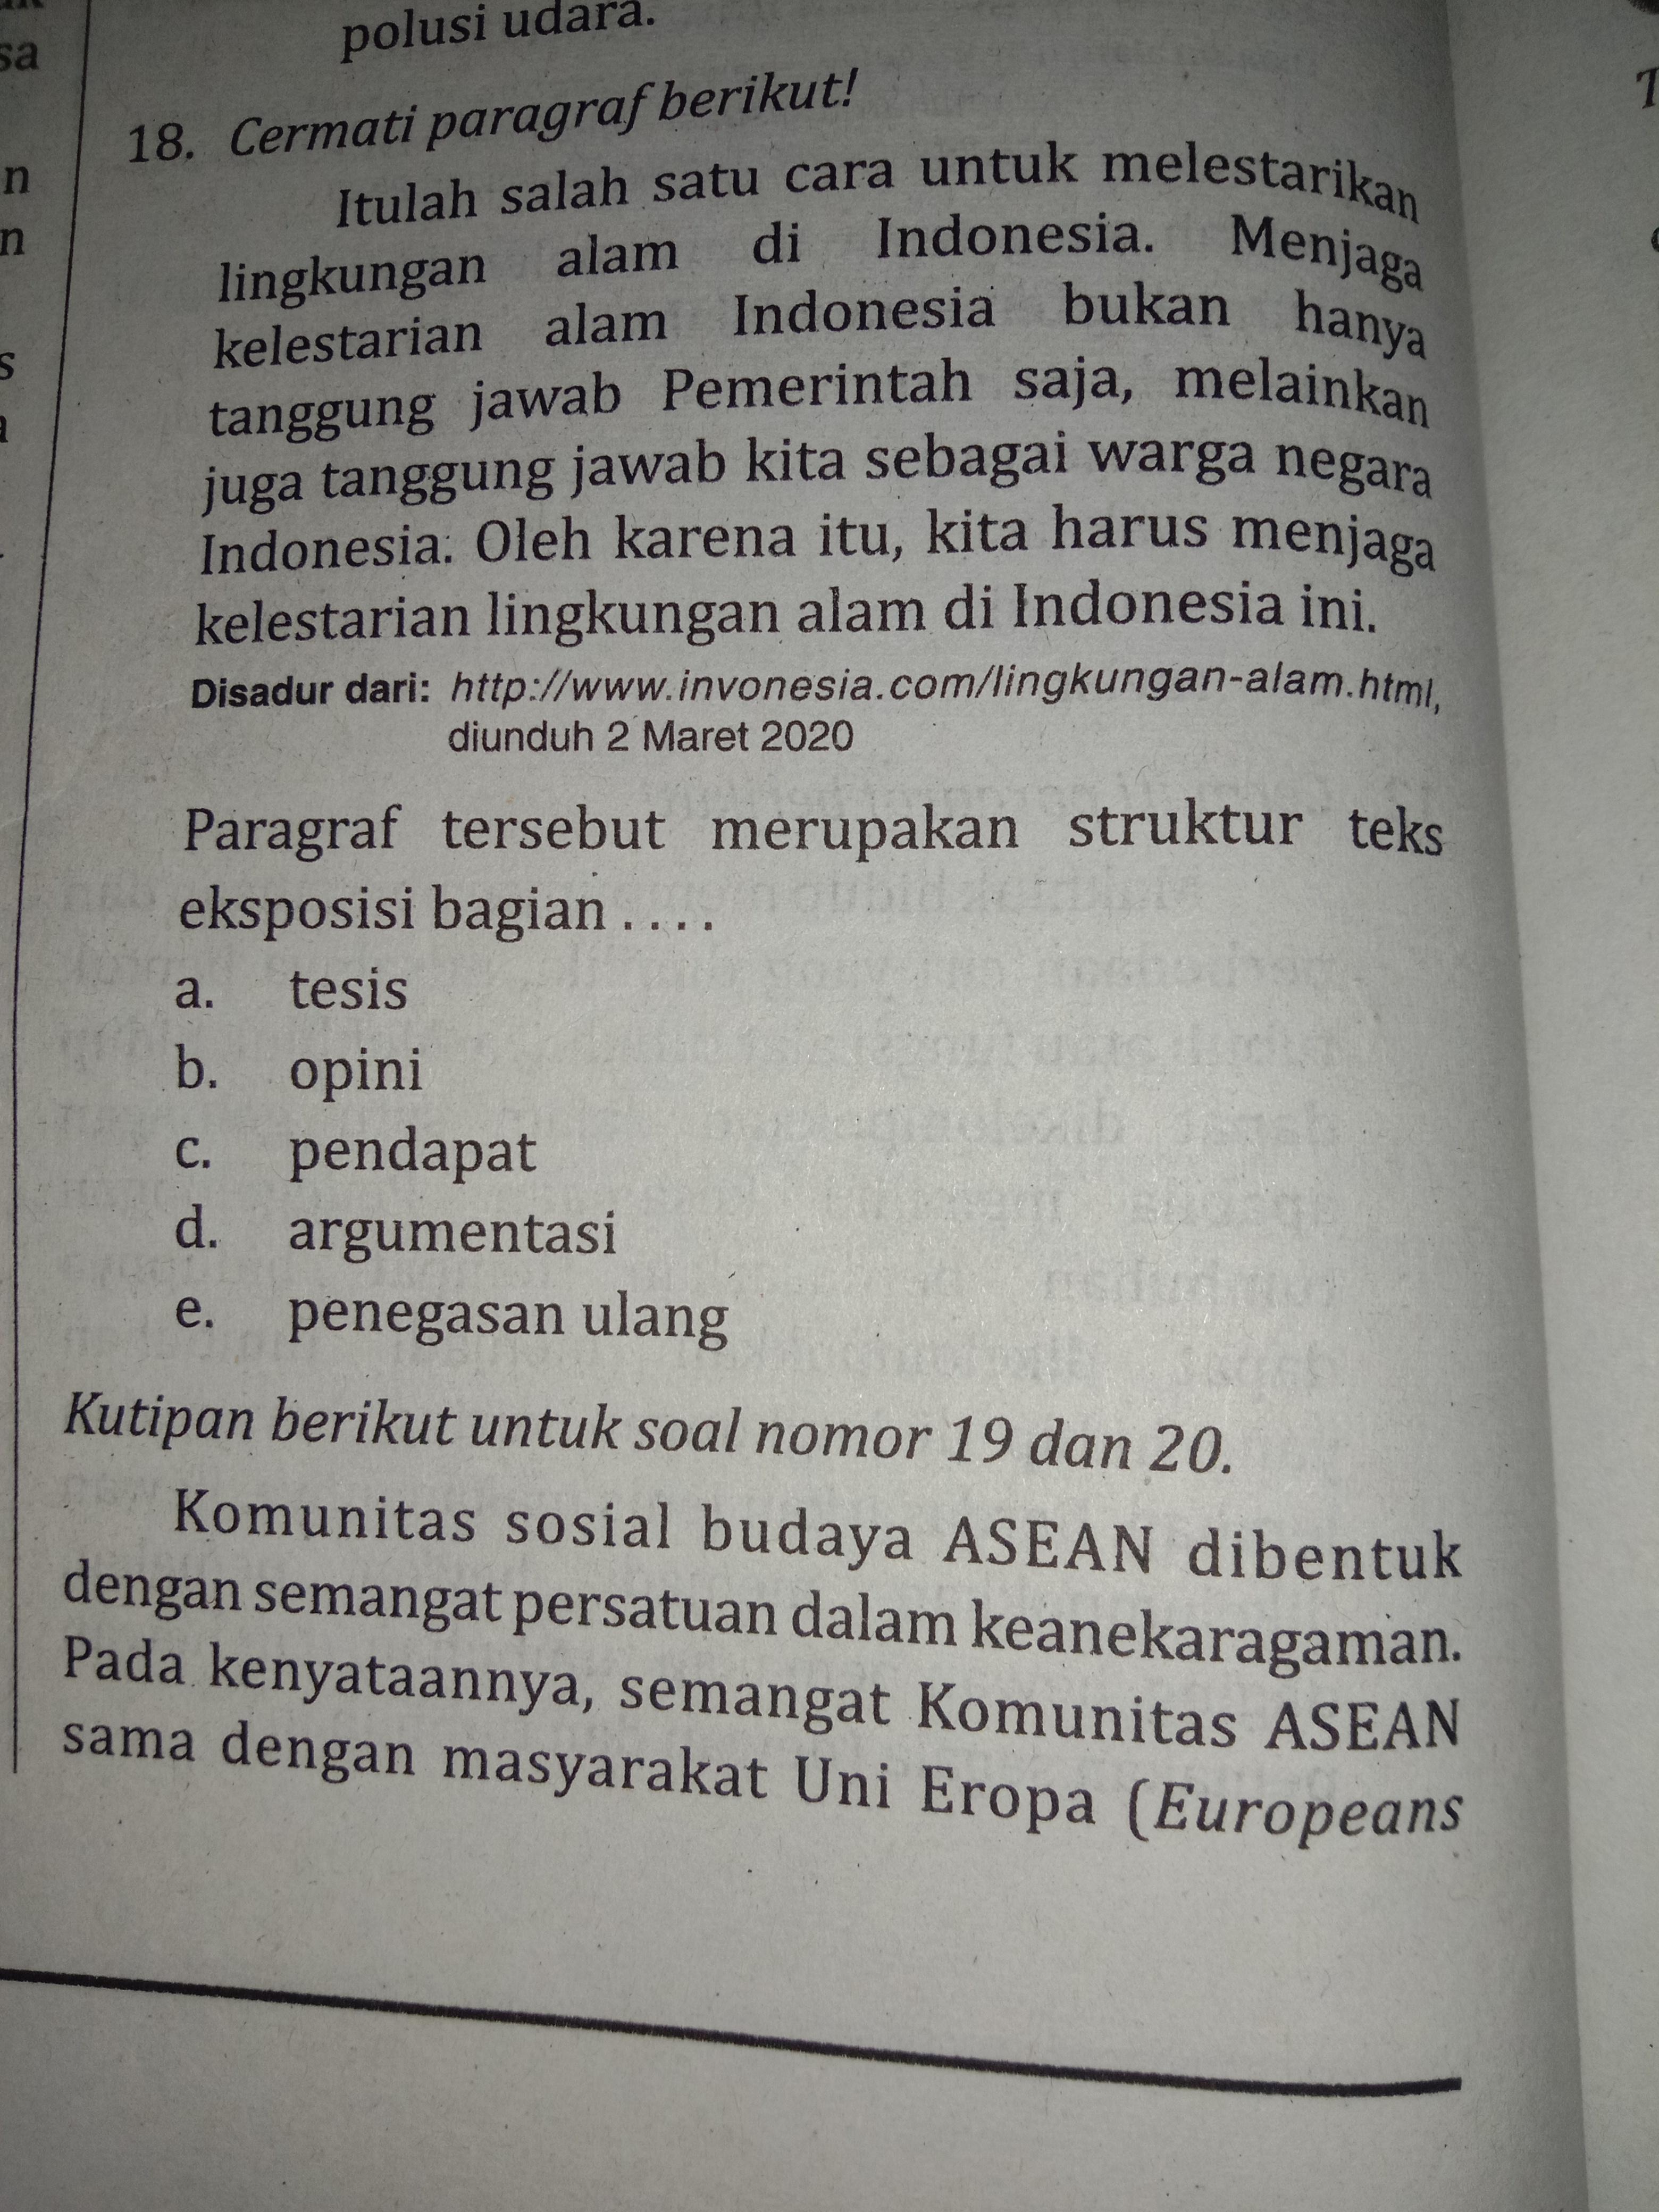 Struktur Teks Argumentasi : struktur, argumentasi, 18.Paragraf, Tersebut, Merupakan, Struktur, Eksposisi, Bagian.., A.tesis, C.pendapat, B.opini, Brainly.co.id